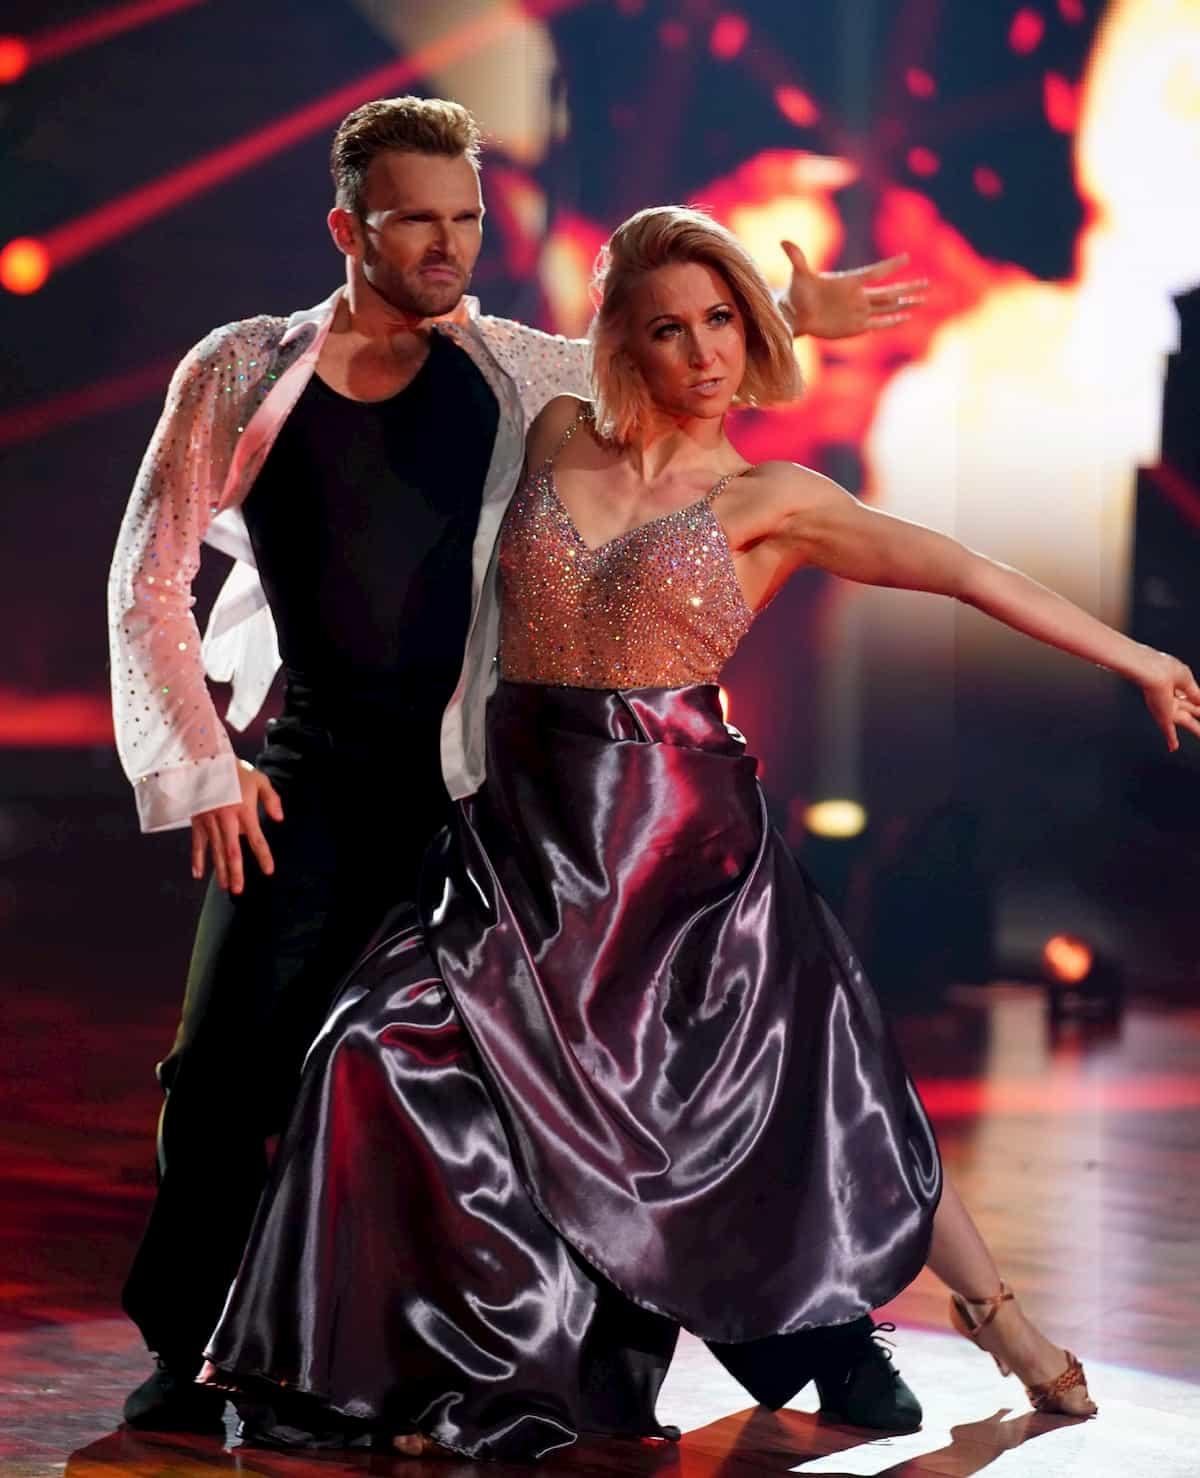 Vadim Garbuzov - Kathrin Menzinger bei der Profi-Challenge Let's dance am 29.5.2020